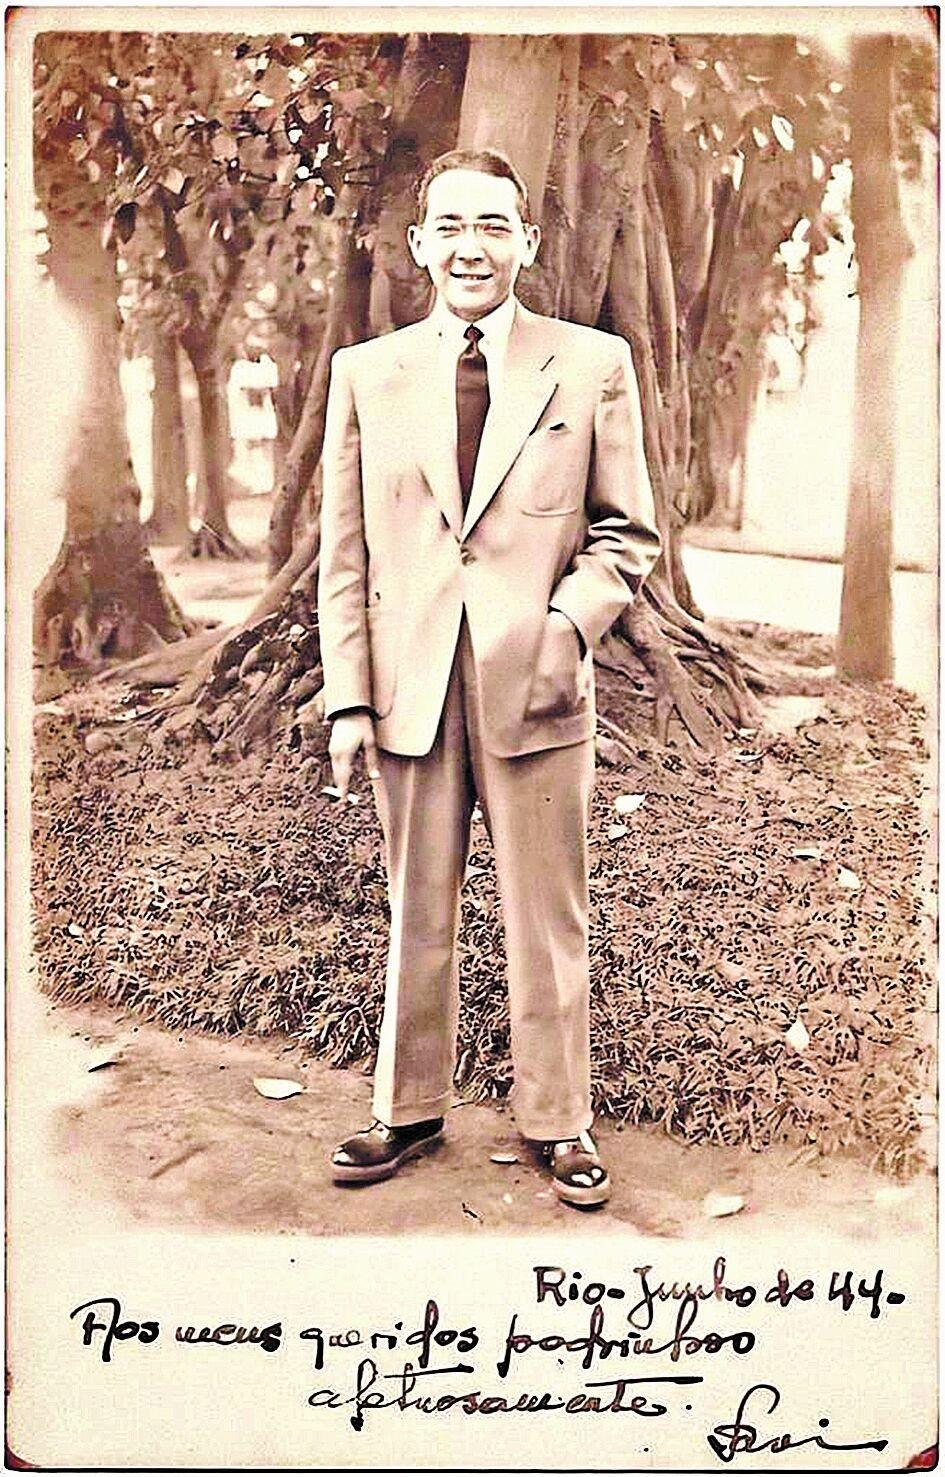 Acyr Castro (1934-2016), jornalista, escritor e crítico de cinema